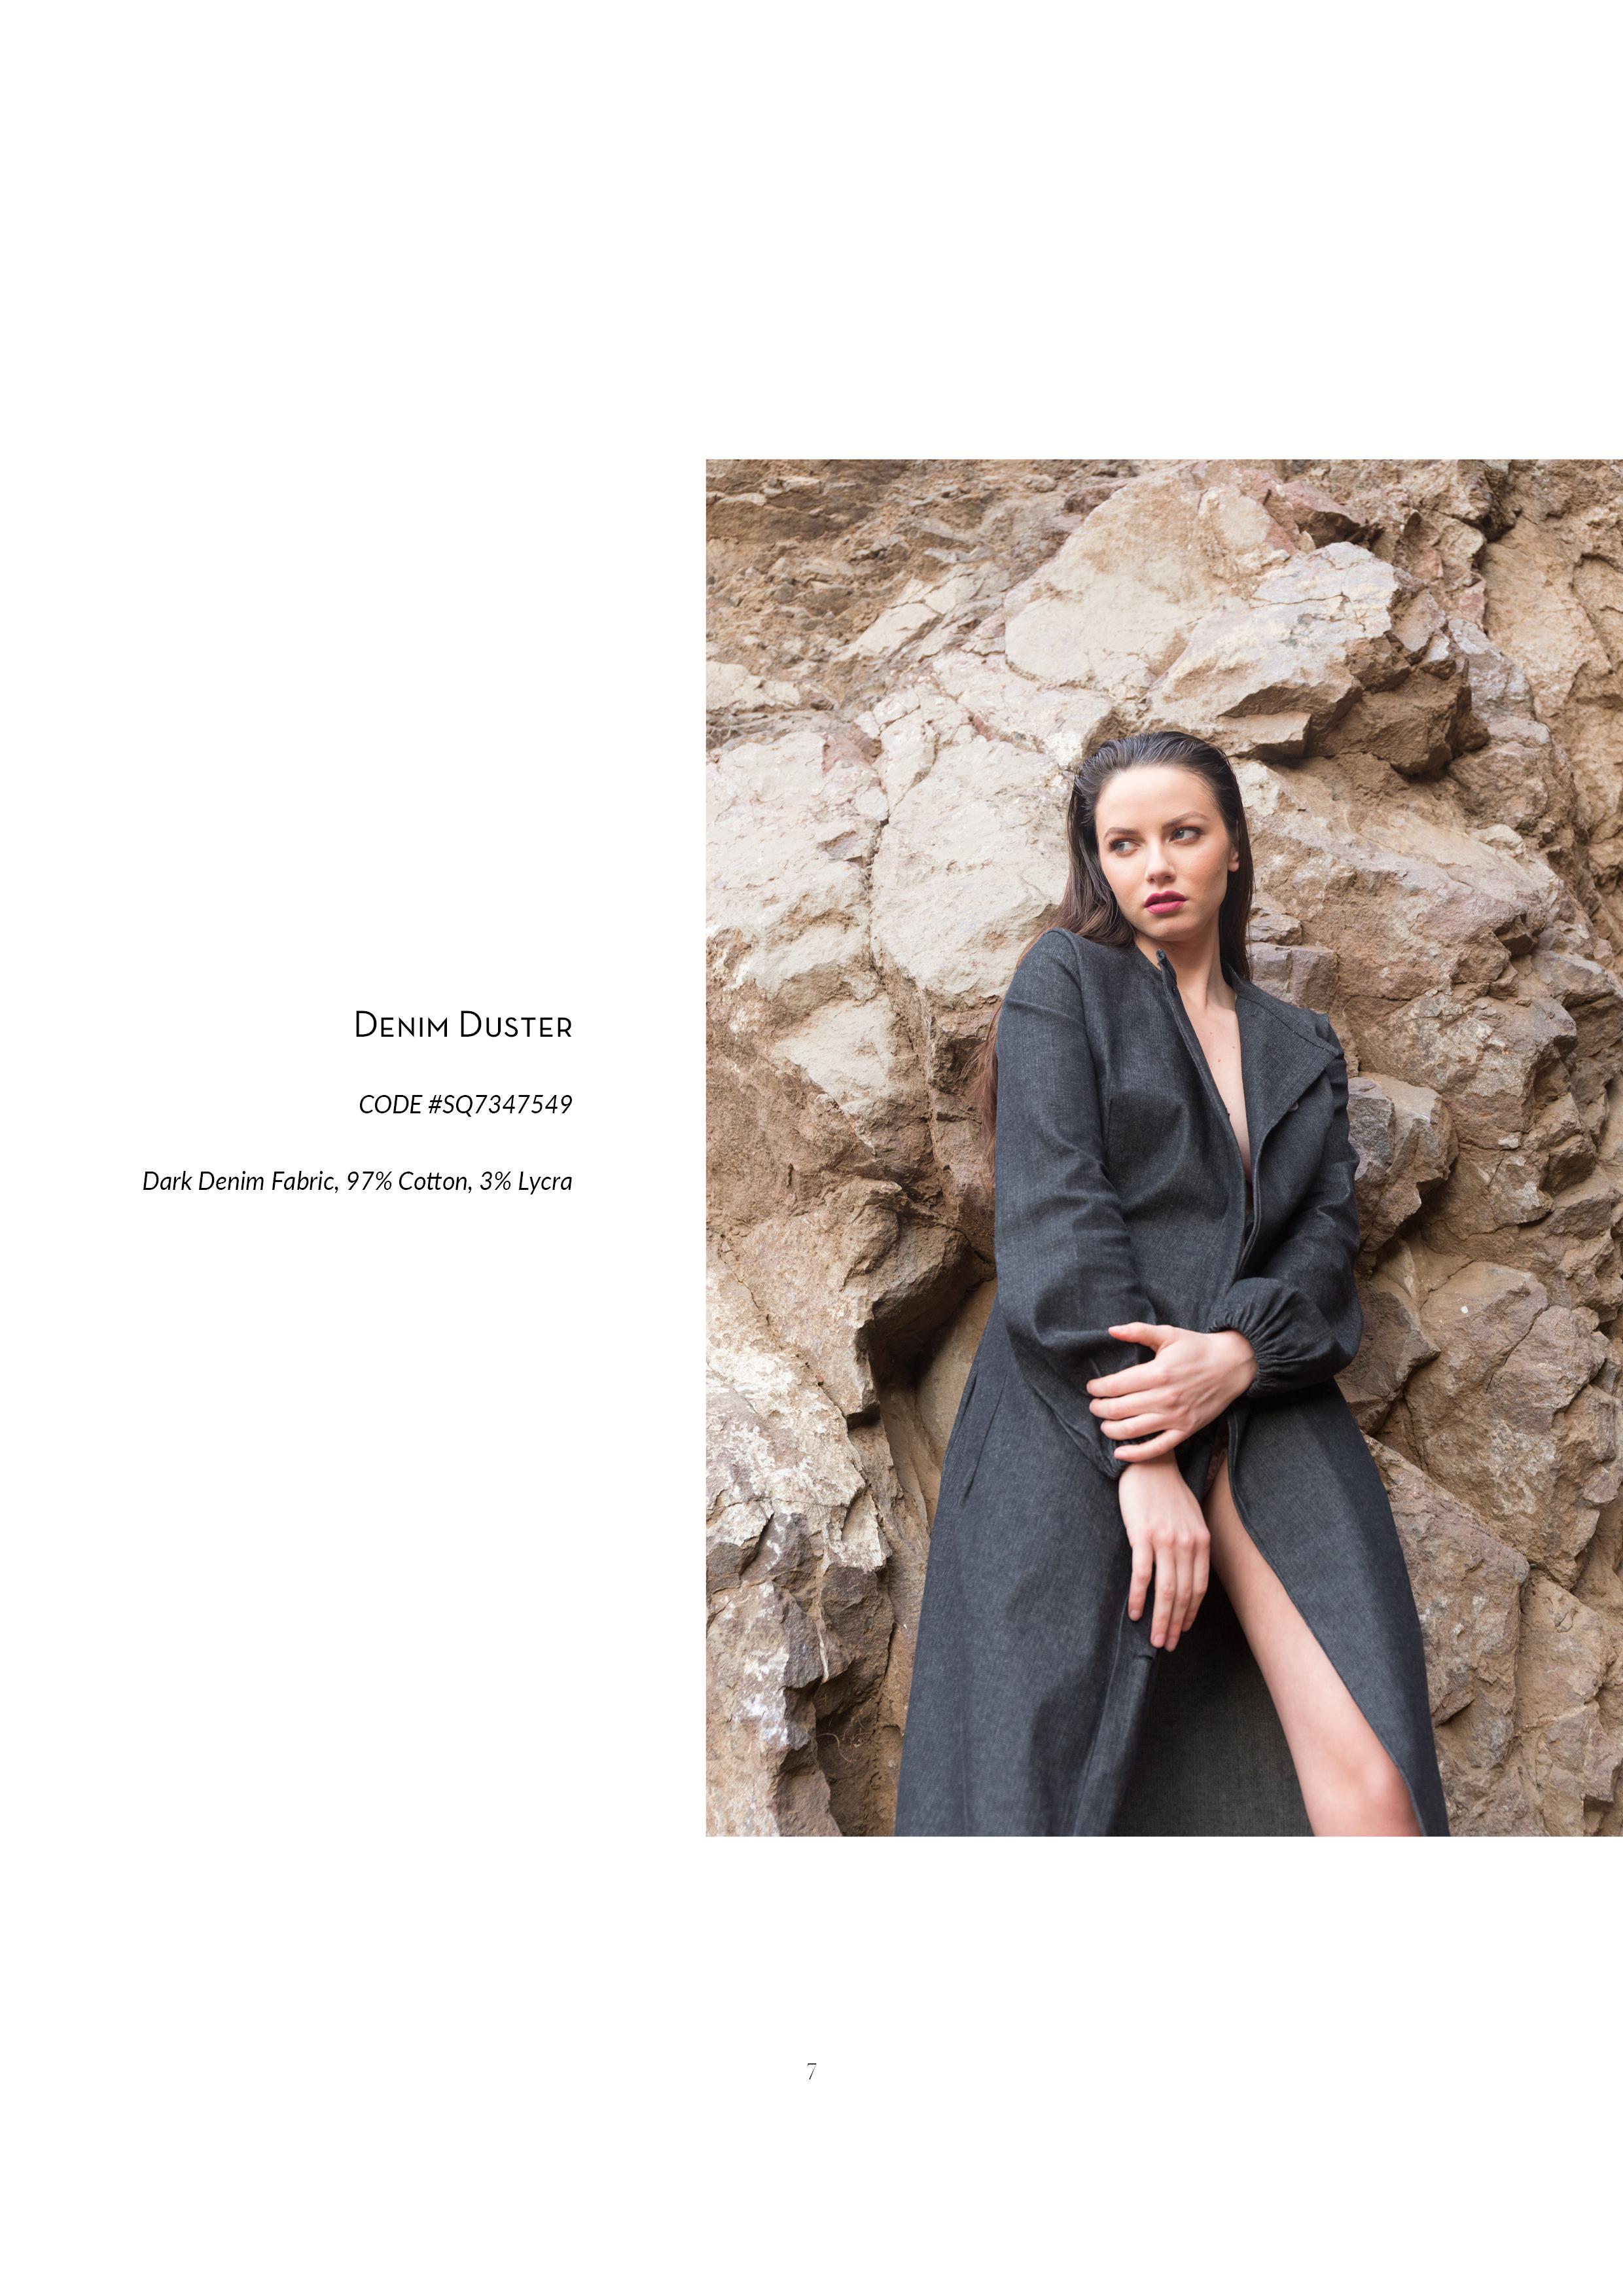 Tiena-Lookbook-Images7.jpg